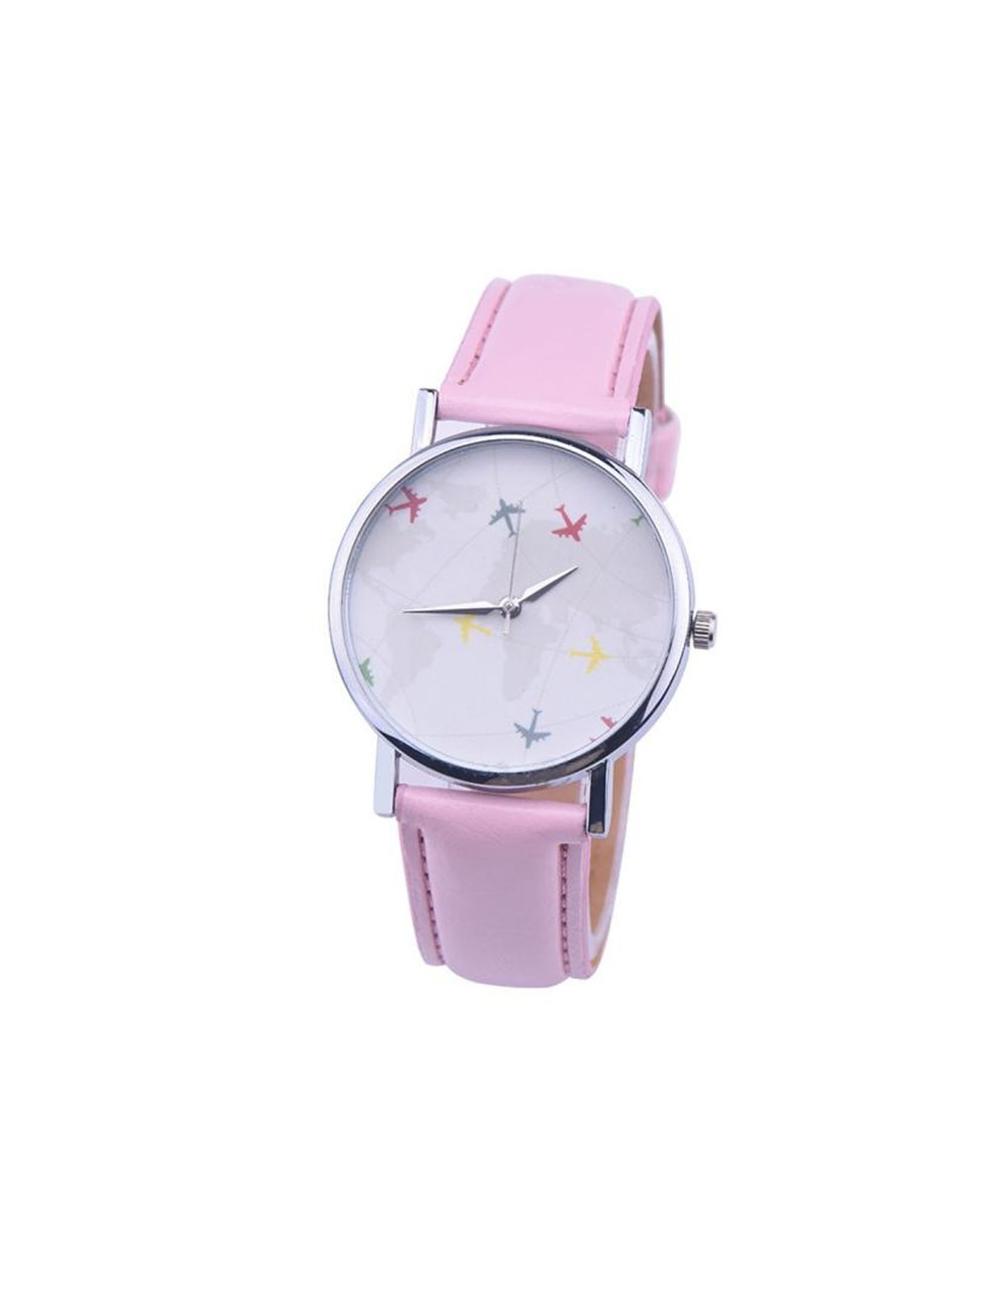 Reloj Rutas Aéreas Dayoshop $31.900